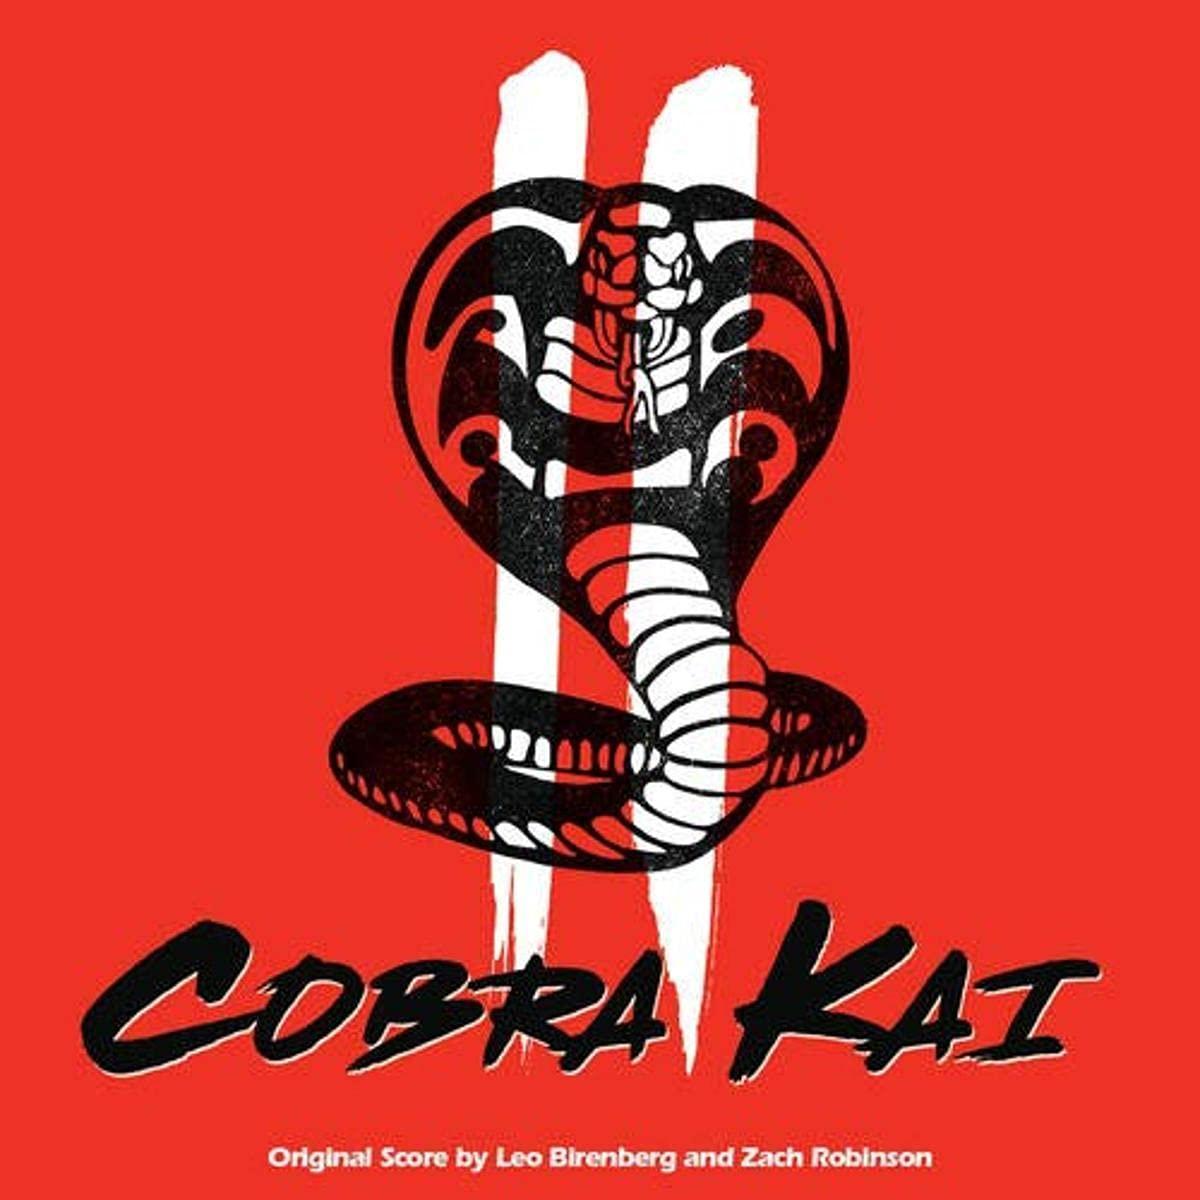 Cobra trust Kai: Season 2 Score Department store Original